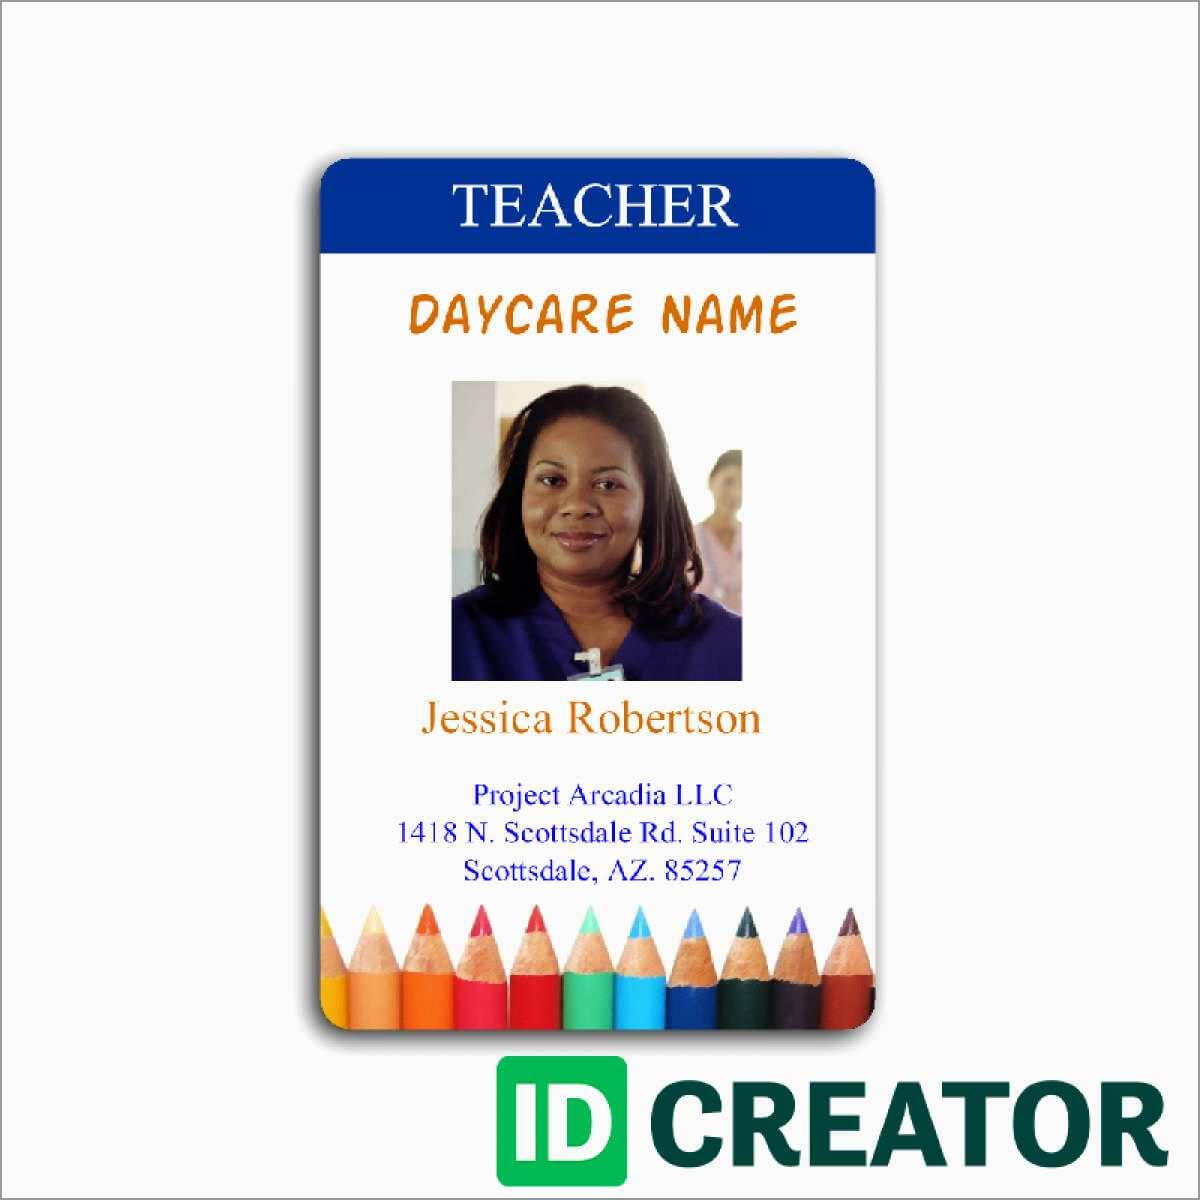 023 Teacher Id Card Photoshop Template Ideas Free Great Regarding Teacher Id Card Template